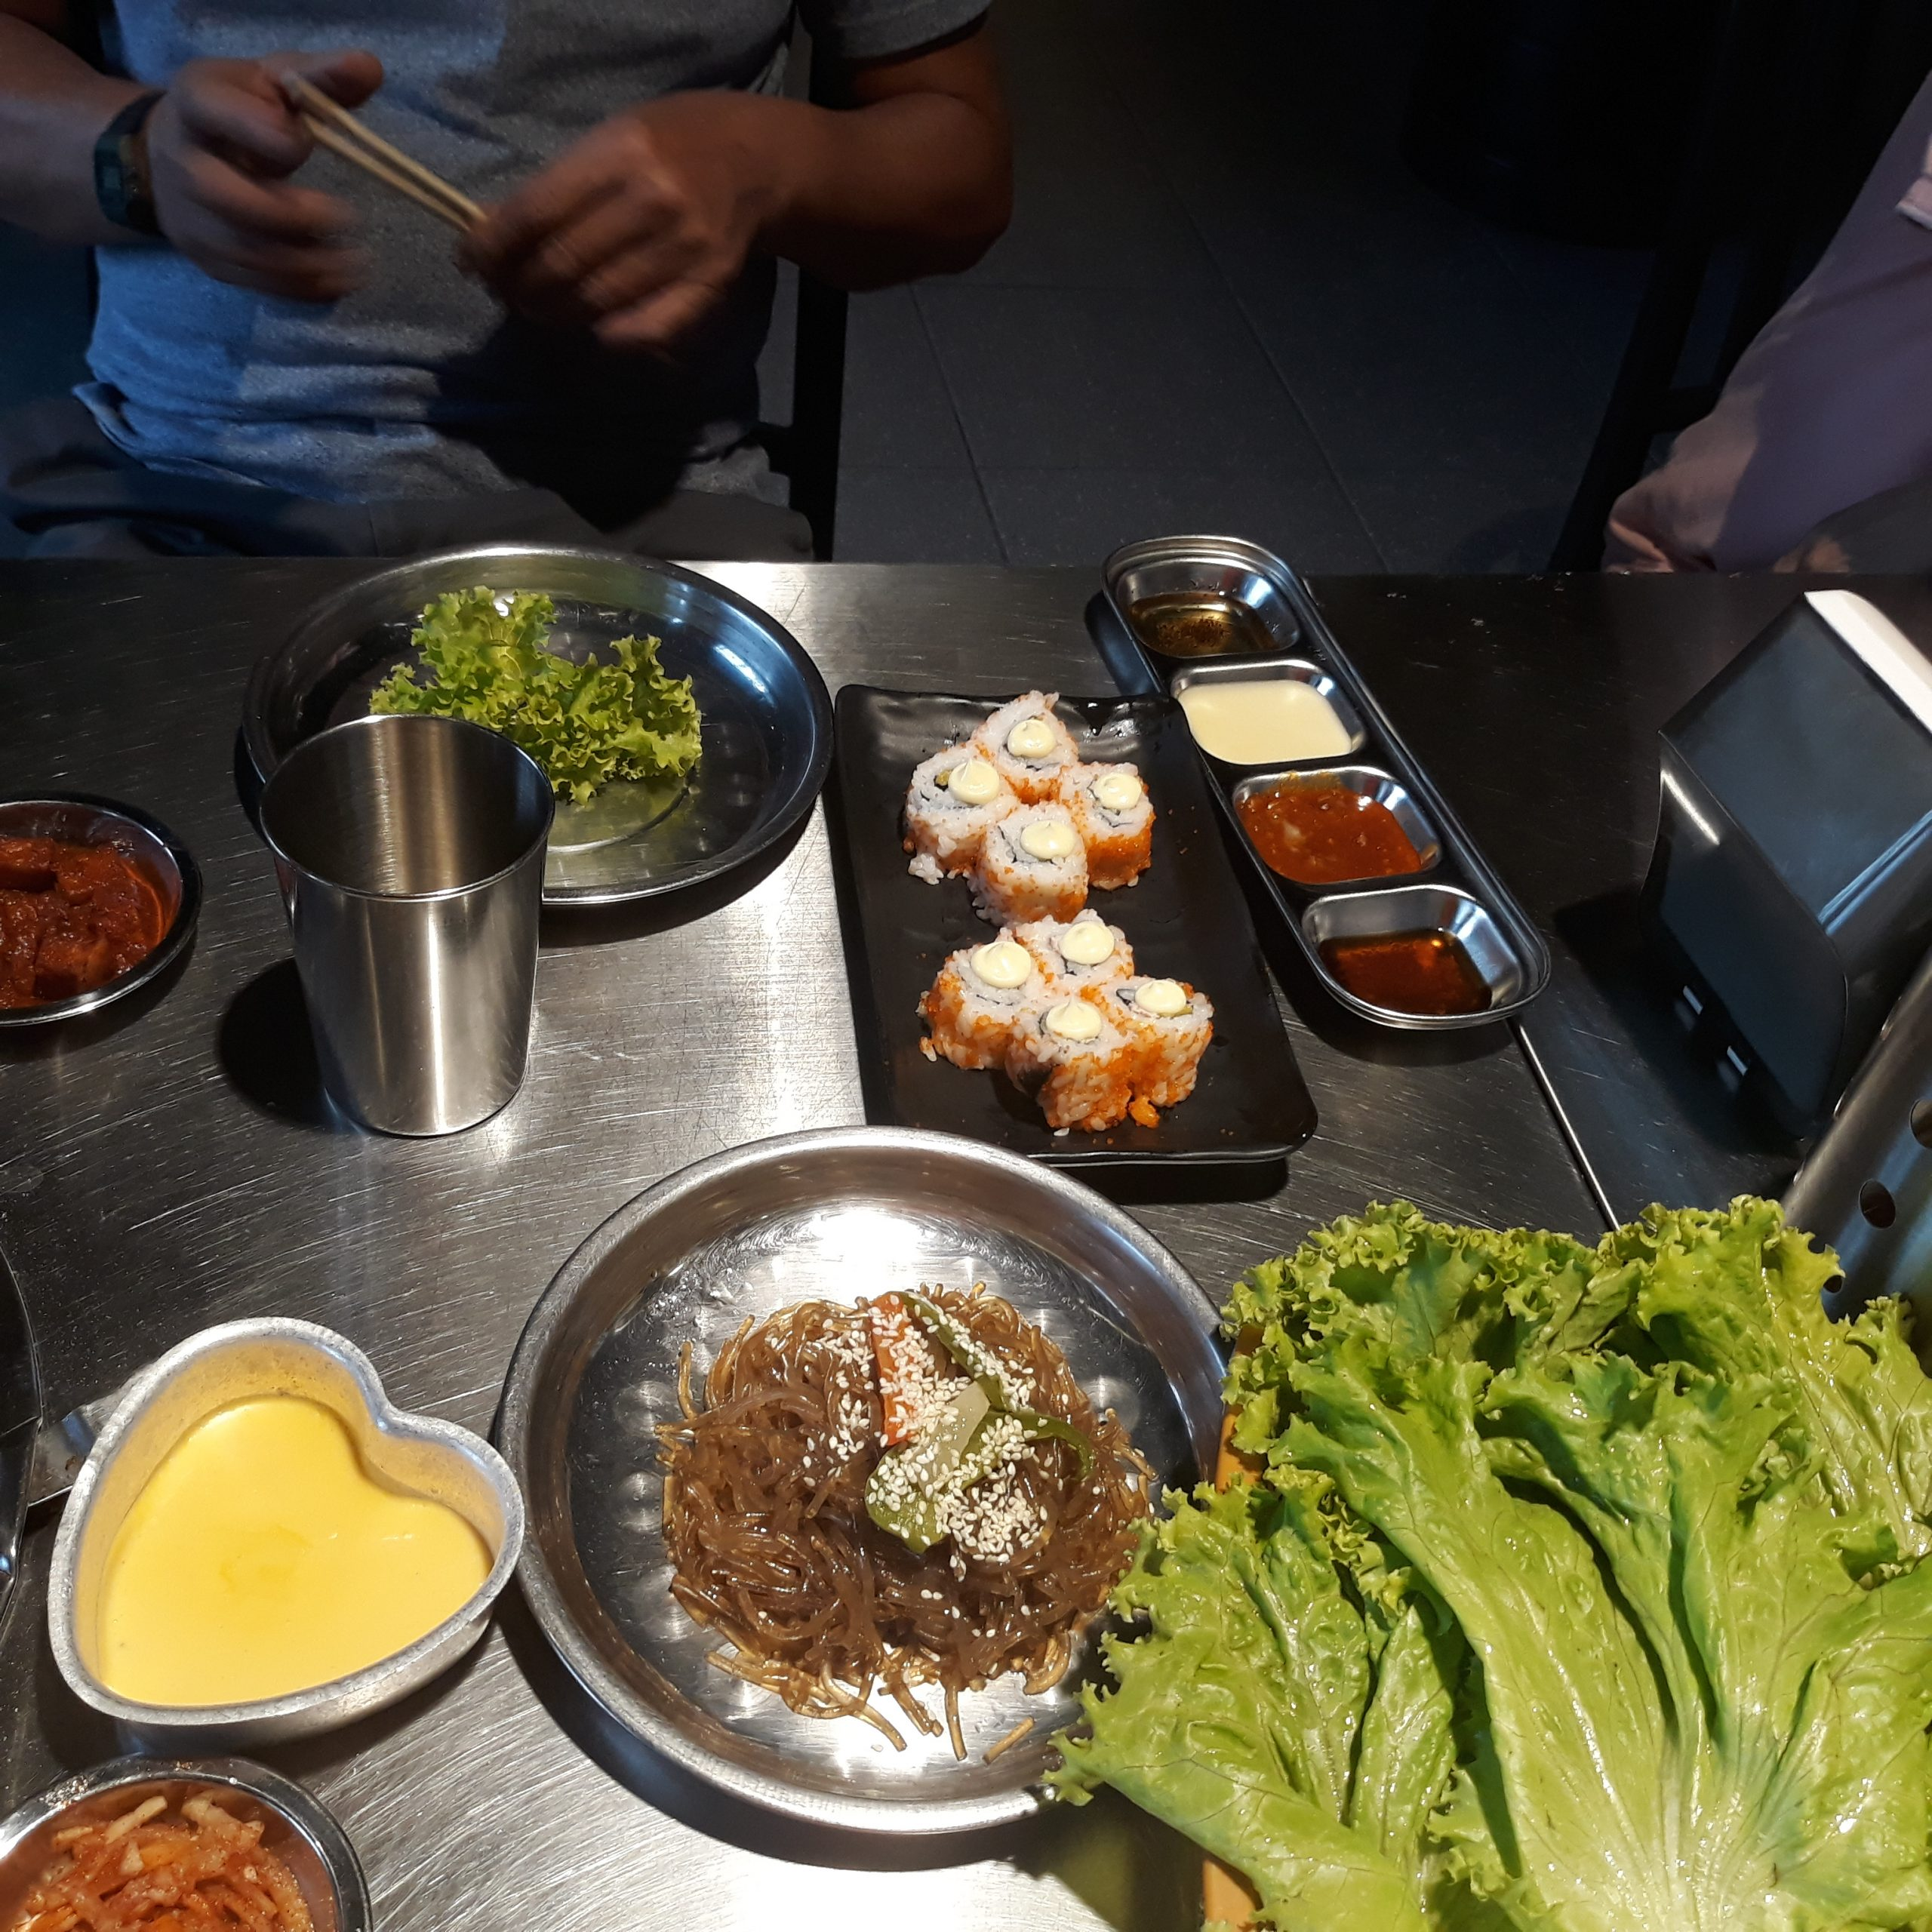 Seoulgyupsal's chap chae, California Maki, and sauces